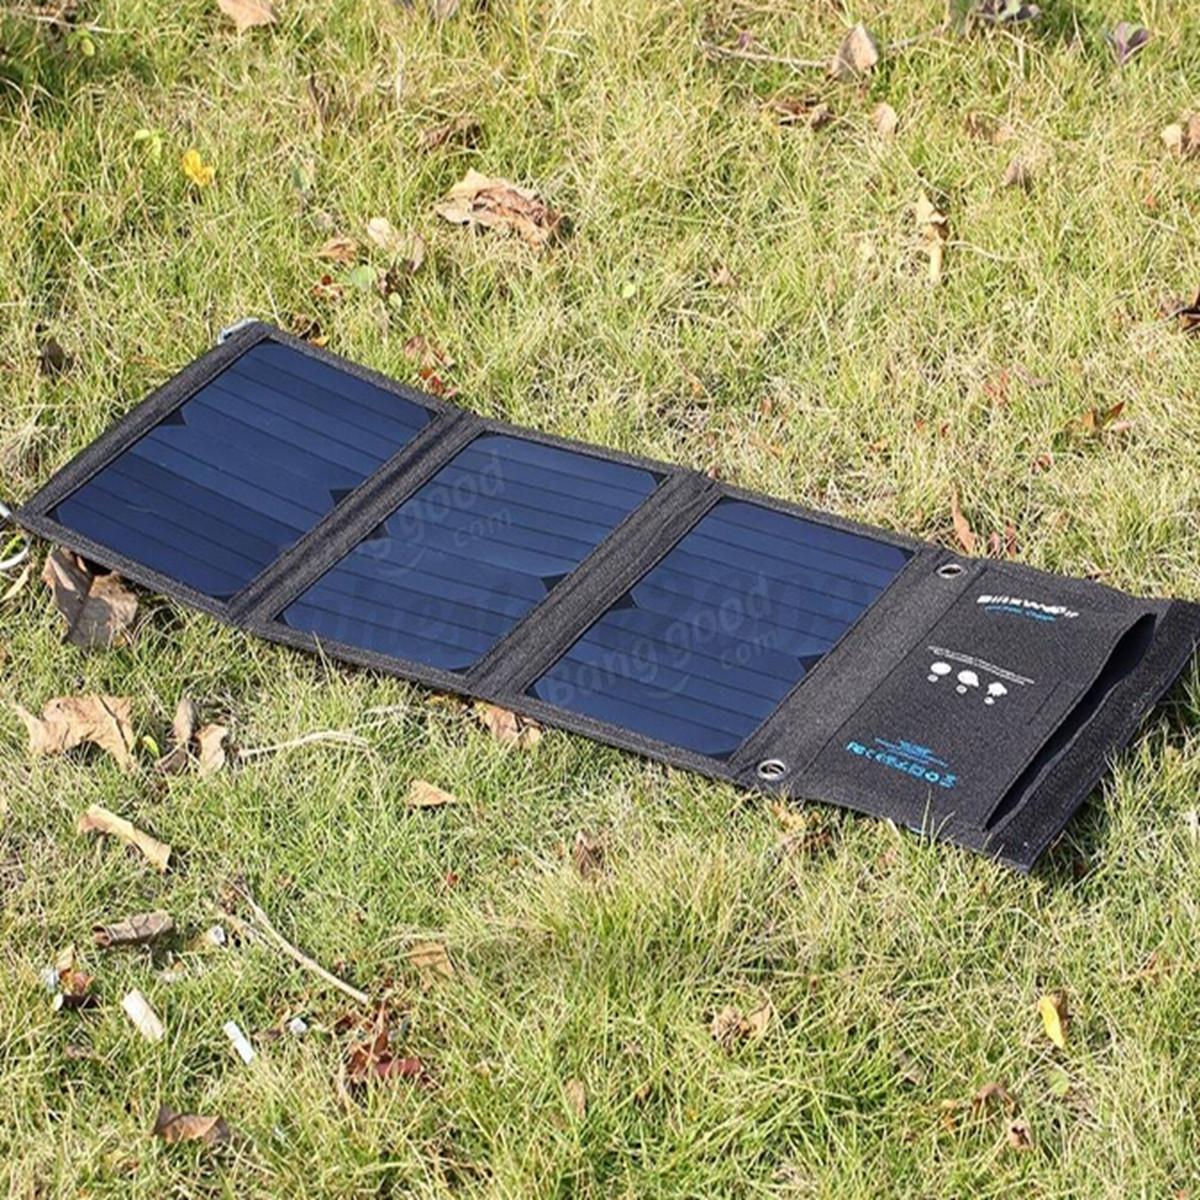 Blitzwolf 20w 3a Foldable Portable Solar Sun Charger Usb